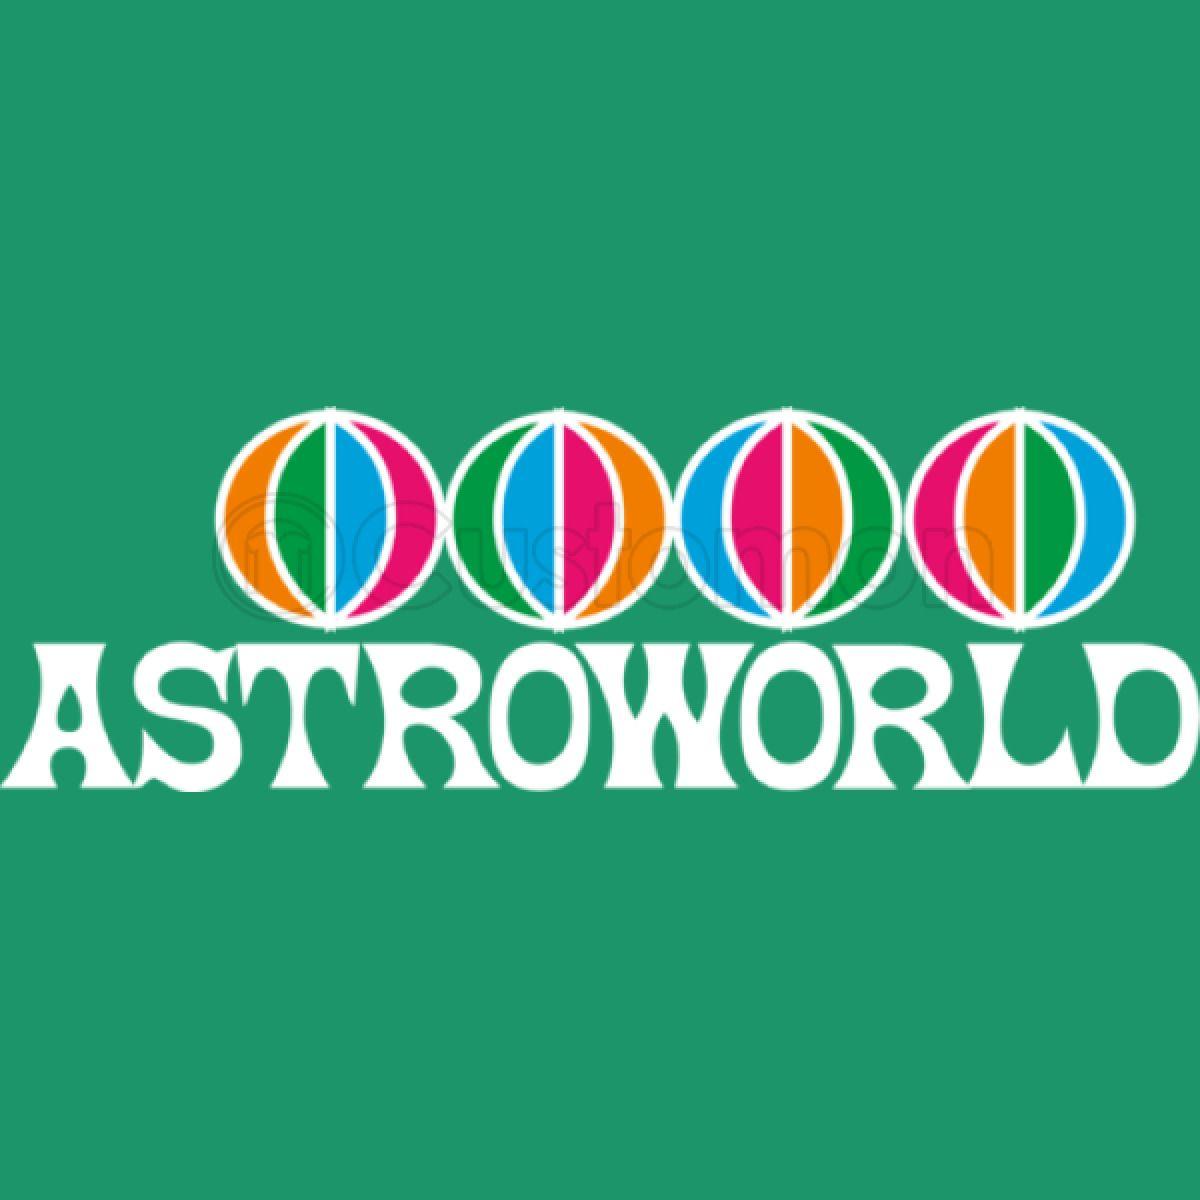 AstroWorld Logo Toddler T-shirt - Customon